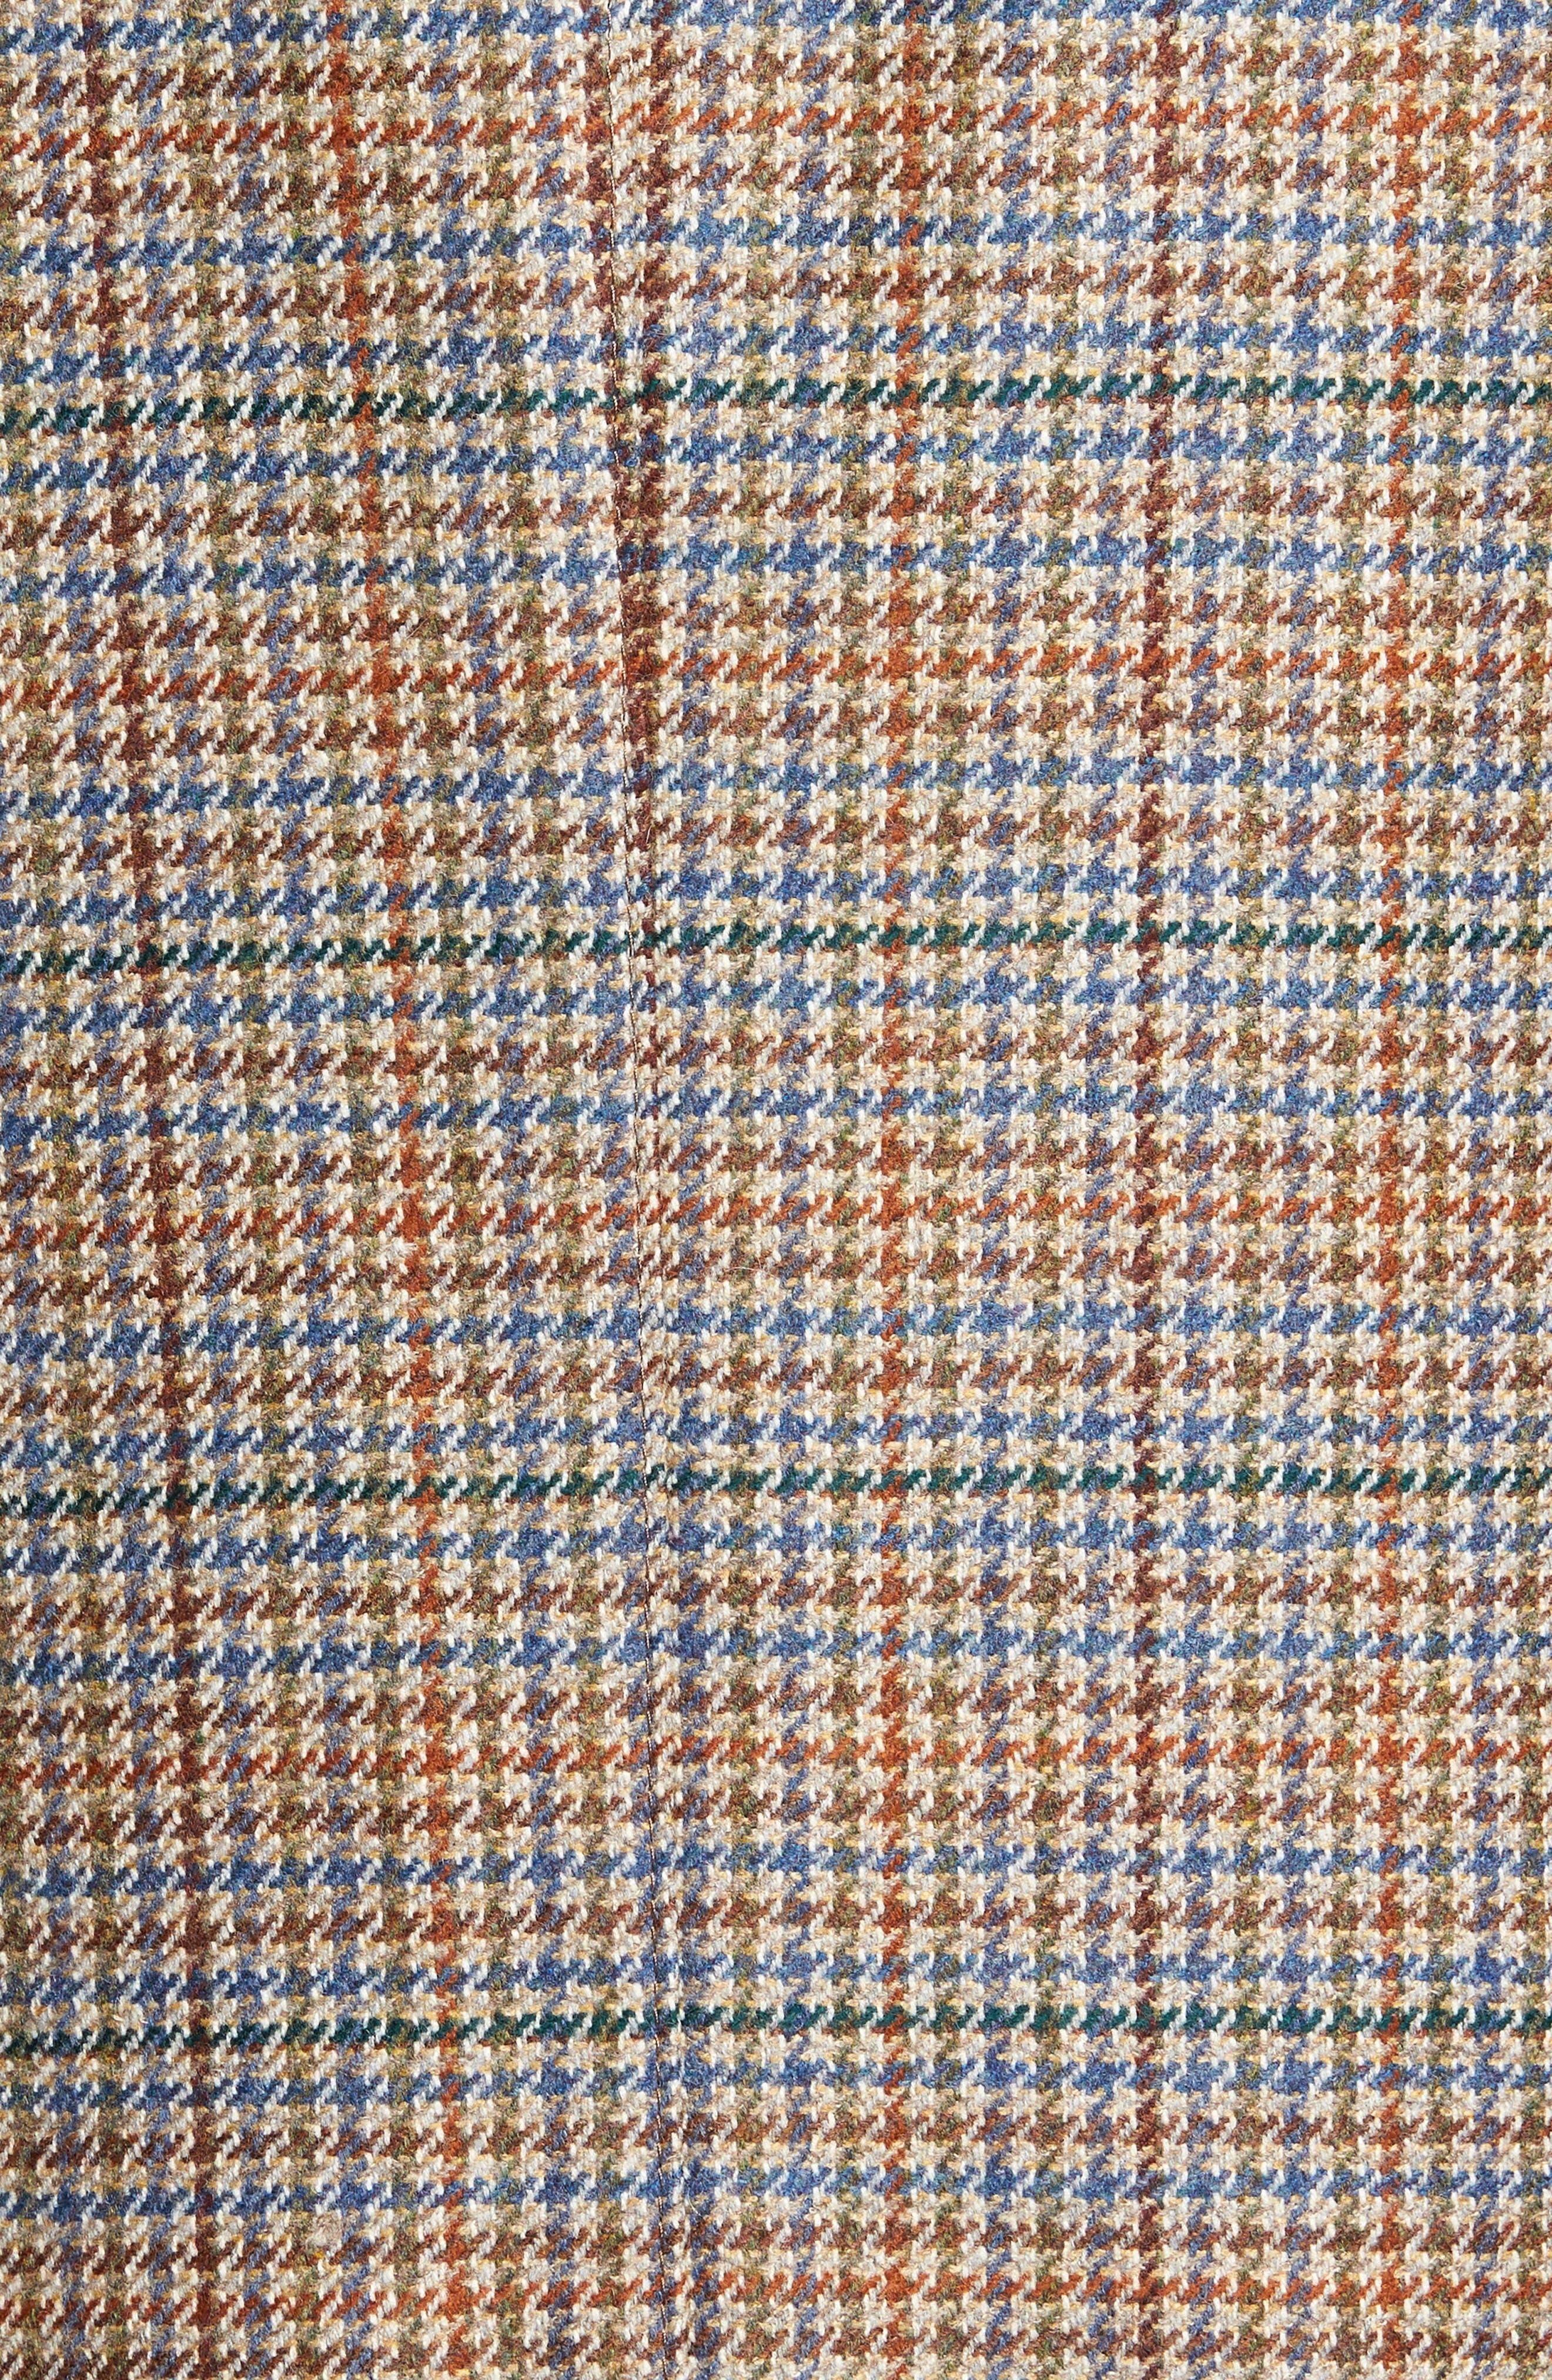 Houndstooth Wool Blend Sport Coat,                             Alternate thumbnail 6, color,                             250